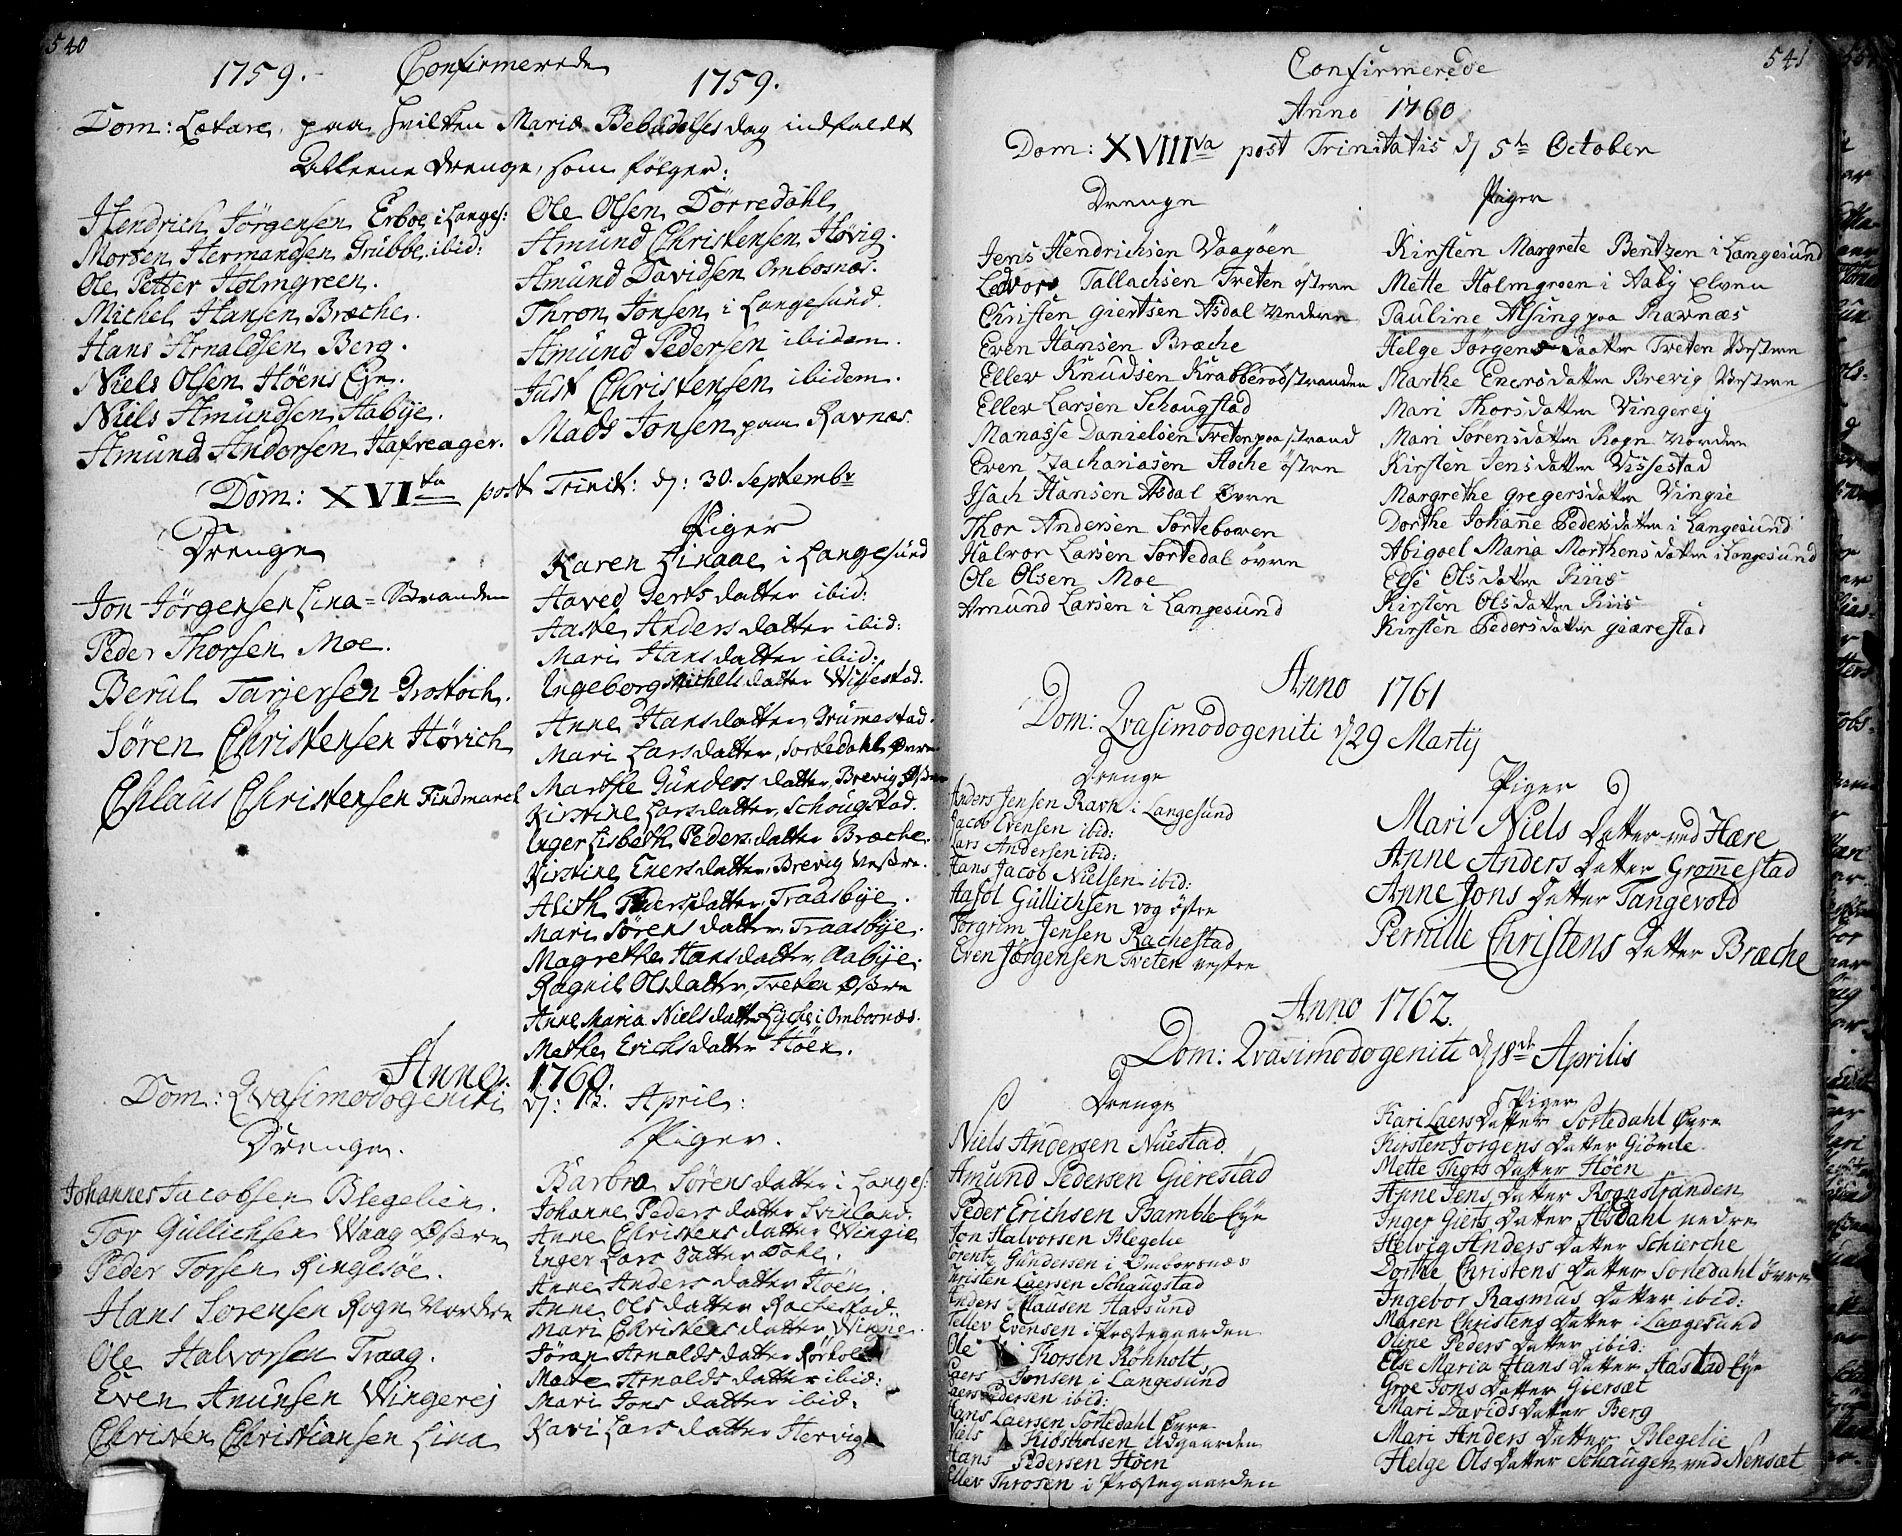 SAKO, Bamble kirkebøker, F/Fa/L0001: Ministerialbok nr. I 1, 1702-1774, s. 540-541